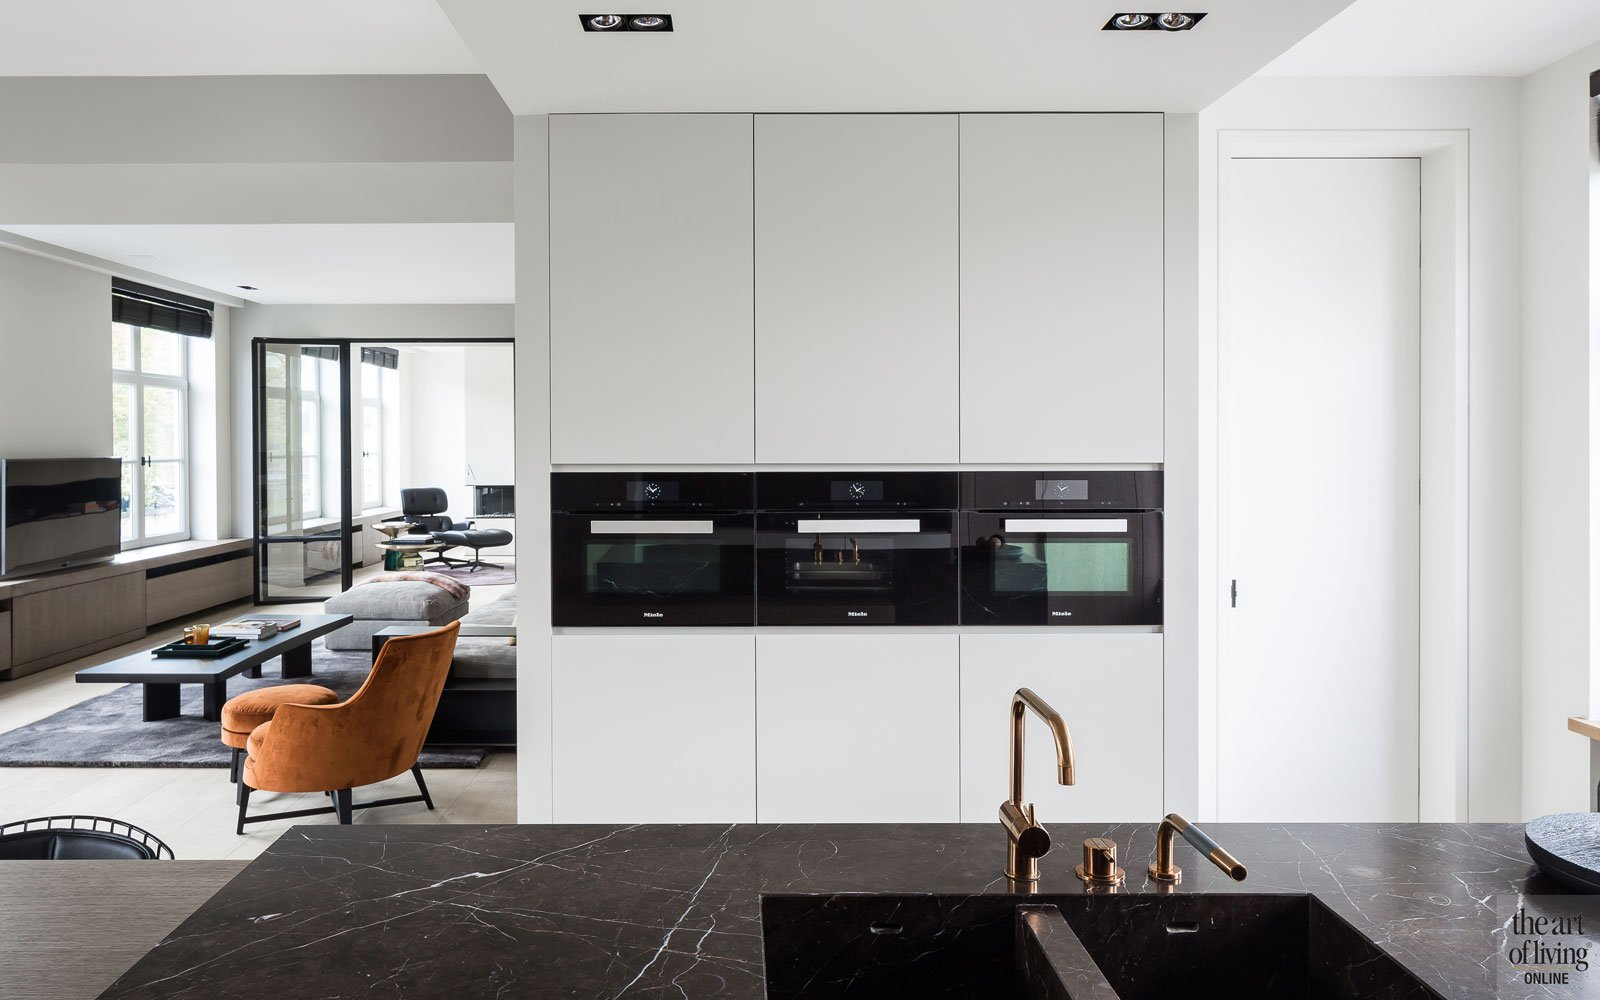 Keuken, natuursteen, open ruimte, apparatuur, kraan, VOLA, parket, Corvelyn NV, renovatie herenhuis, JUMA architects